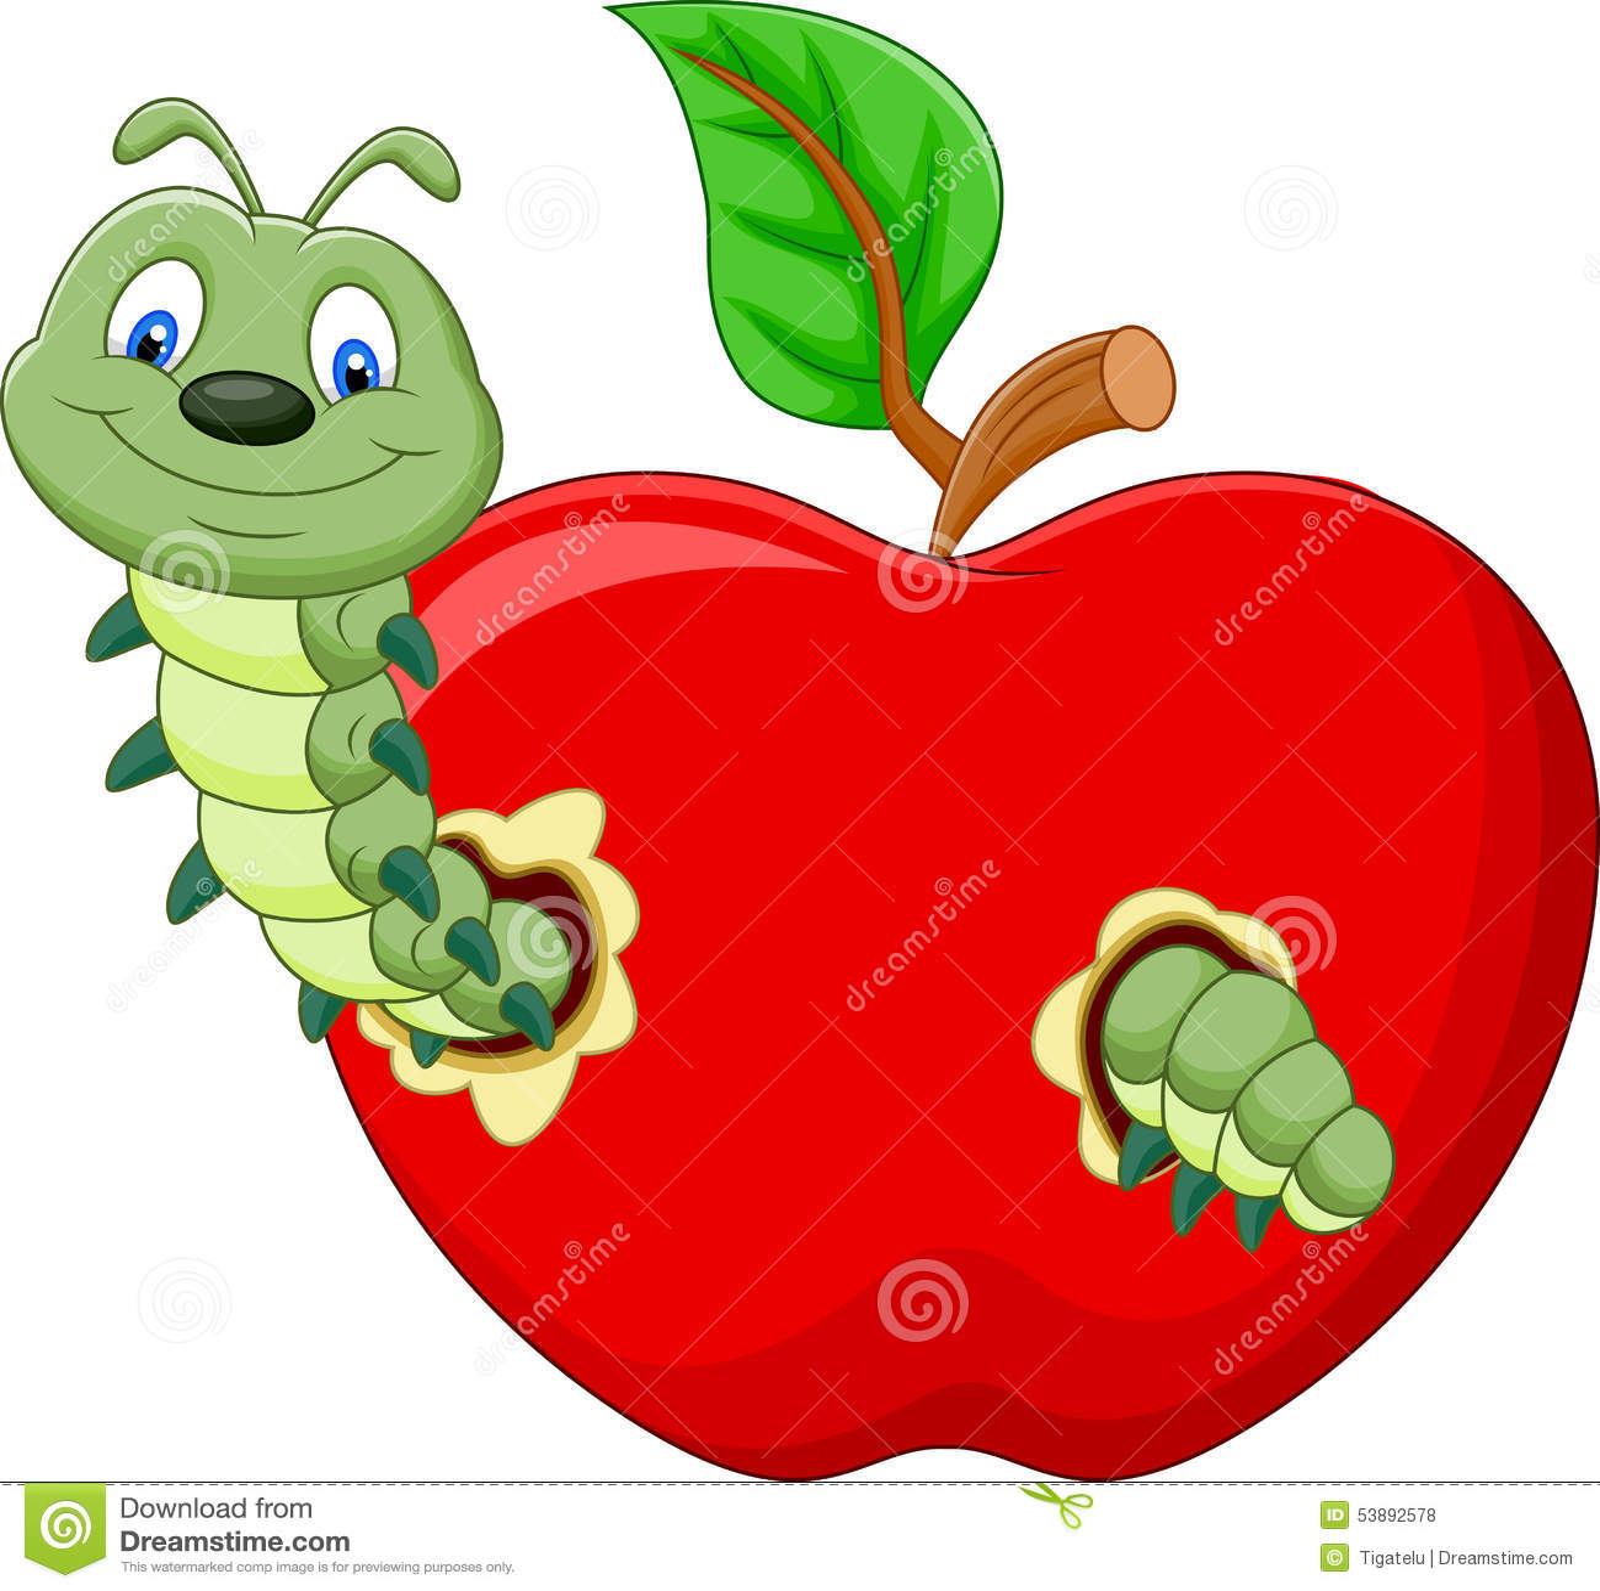 caterpillars cartoon eat the apple stock vector image 53892578